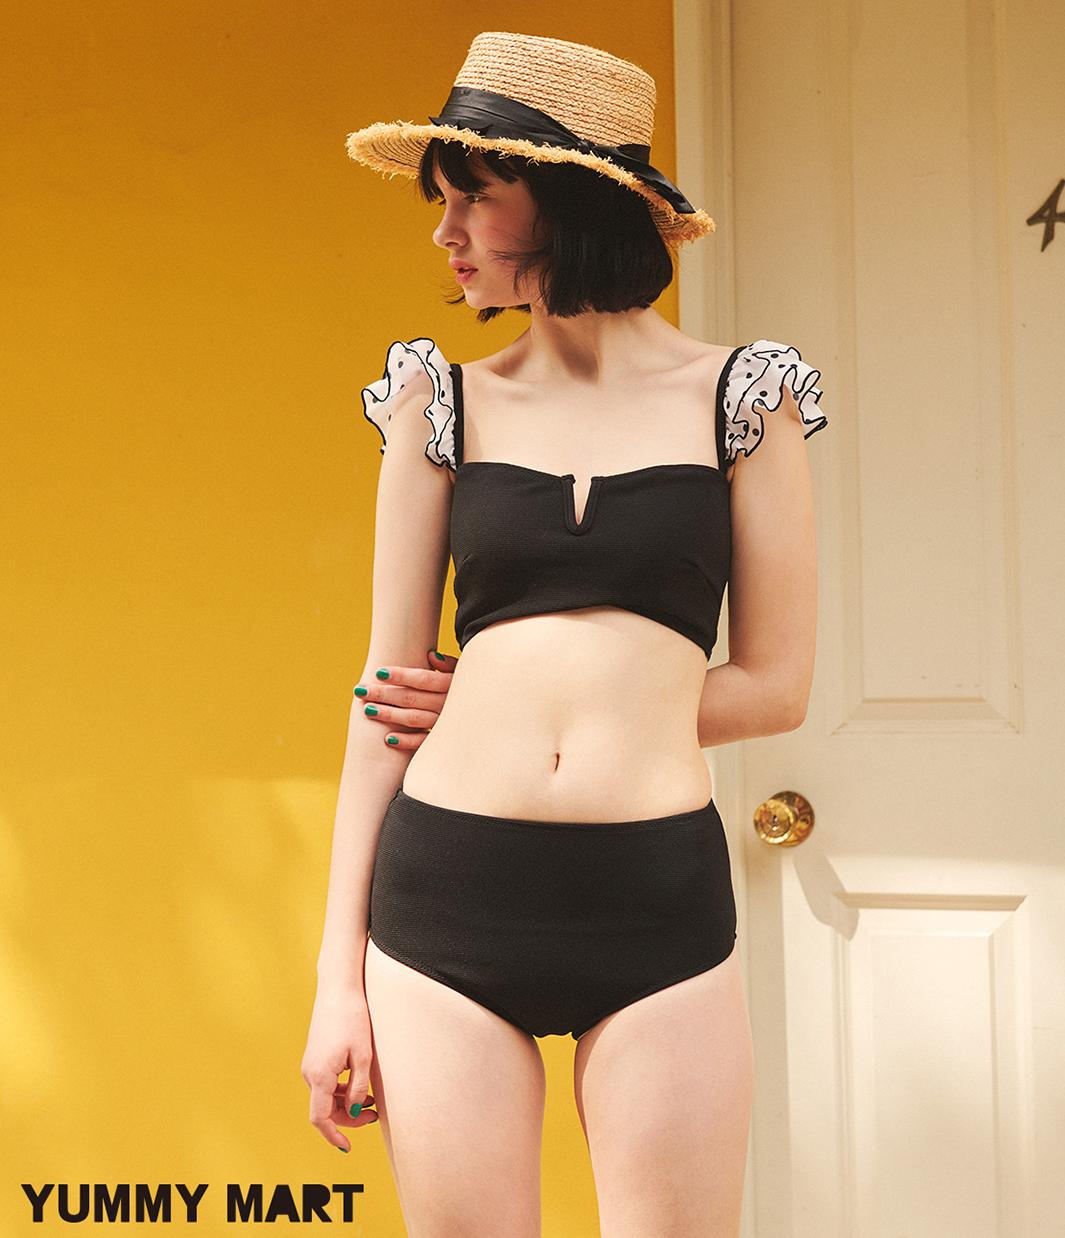 YMショルダーフリルビキニ¥6,980(+税)/サイズ:S、M/カラー:ブラック(全1色)(提供写真)